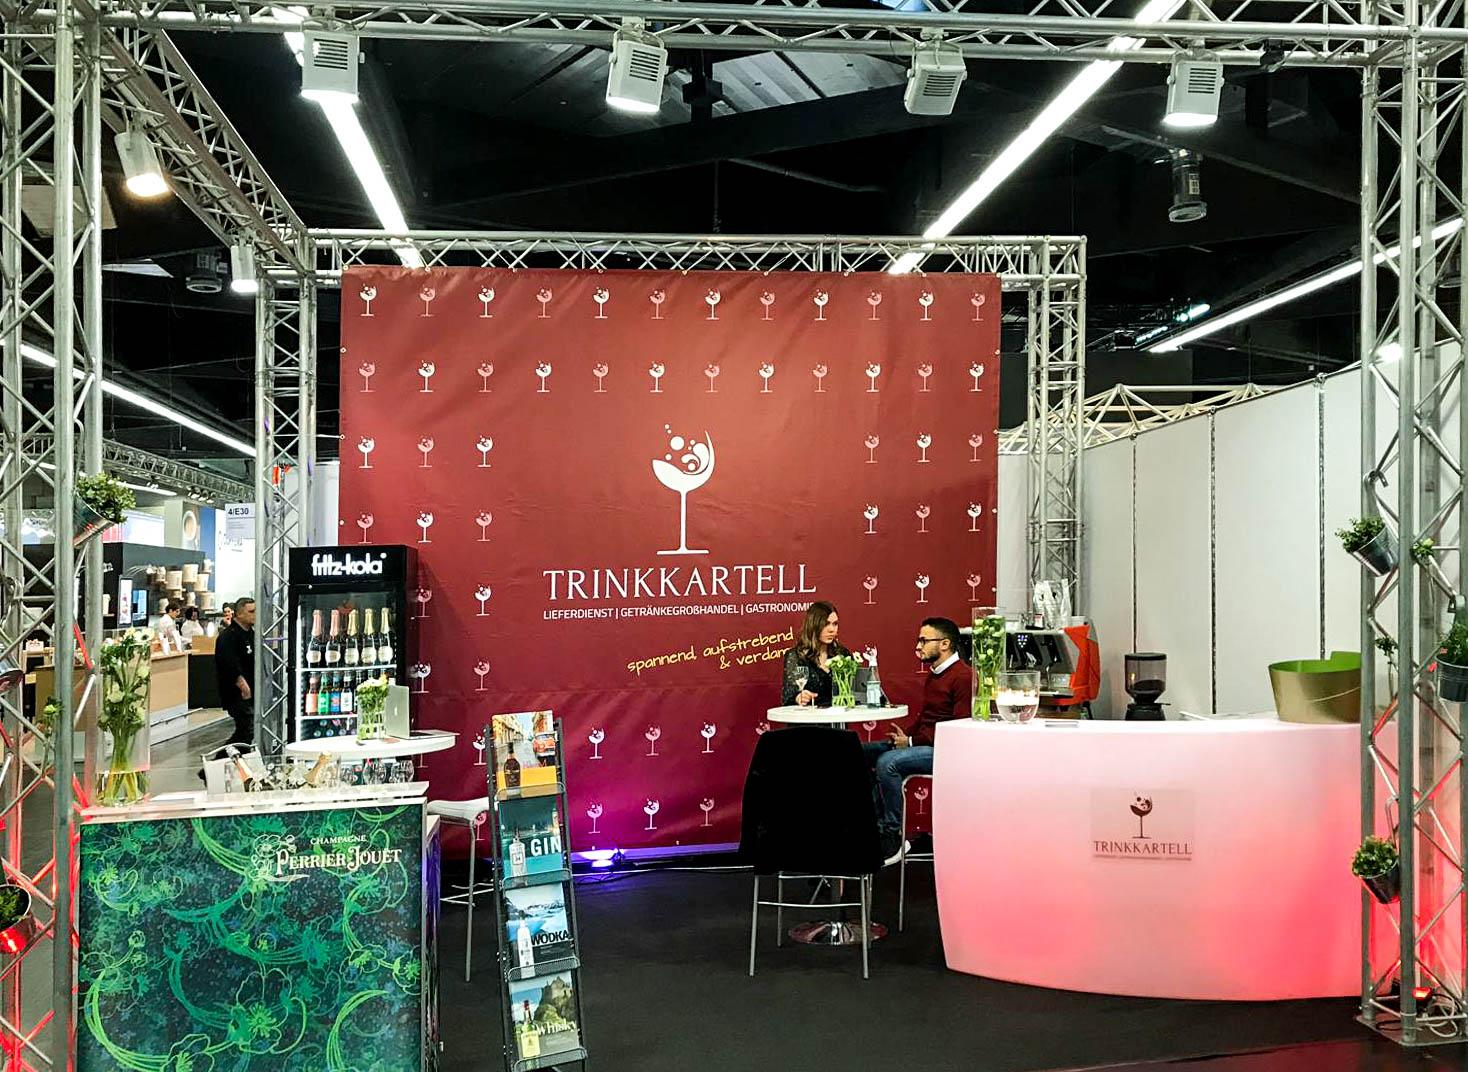 Messestand Trinkkartell GmbH